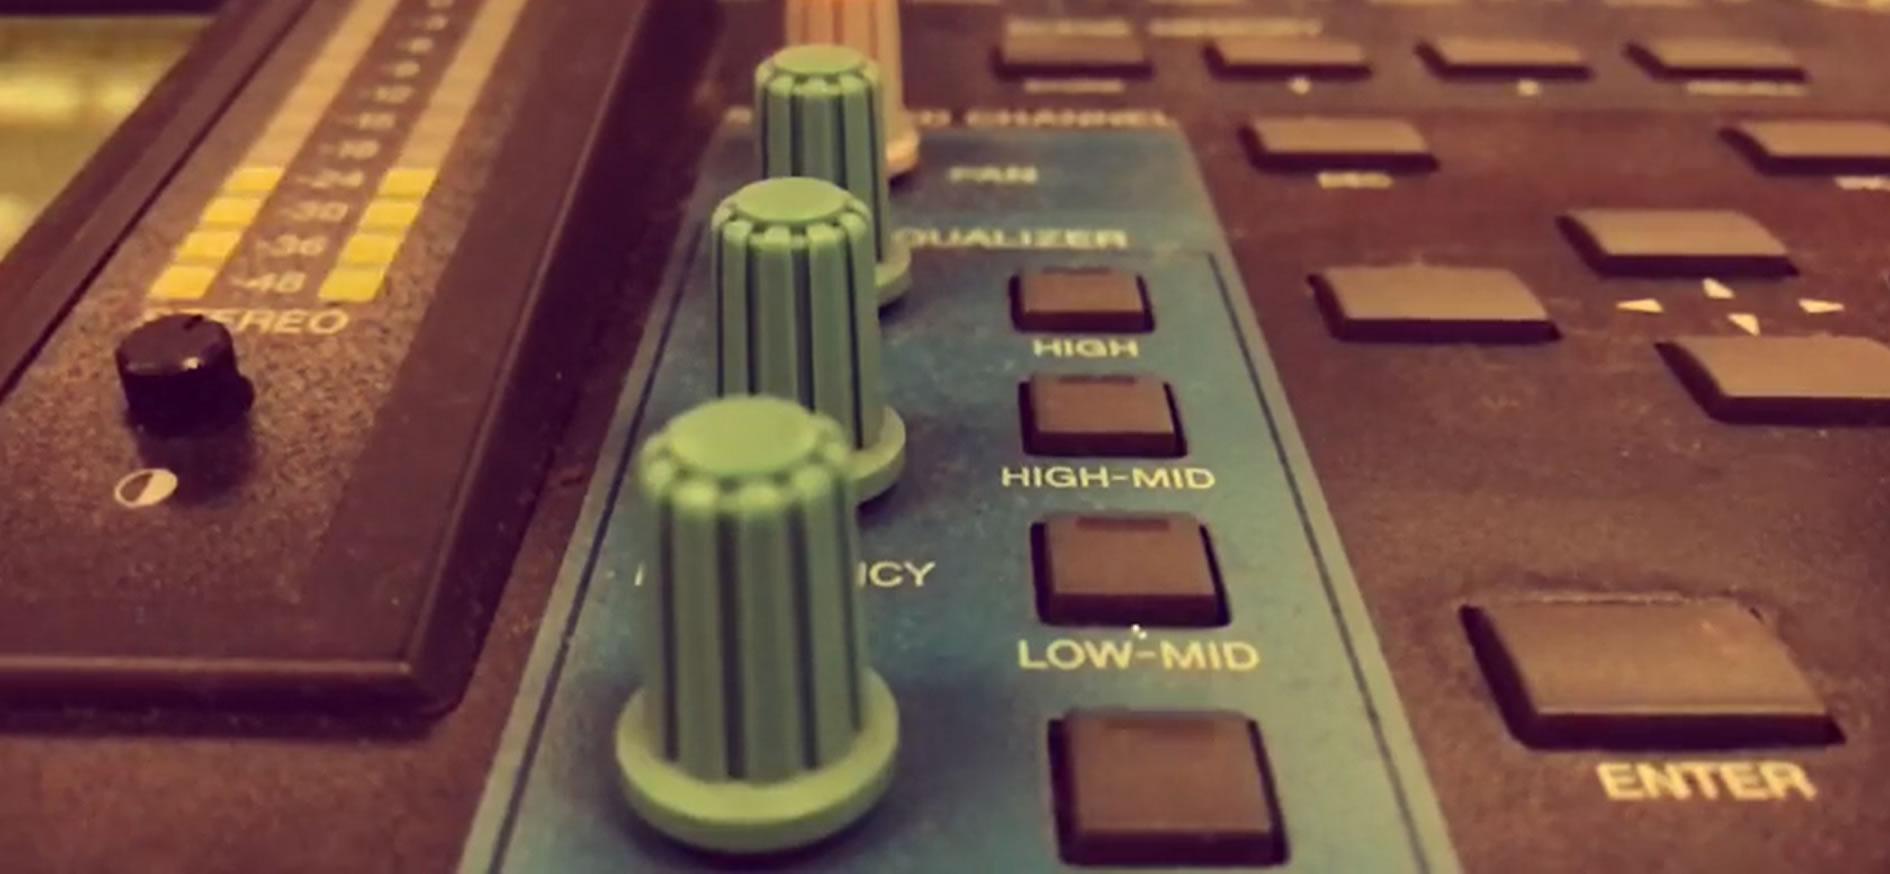 fondo-acustica-consolabnn